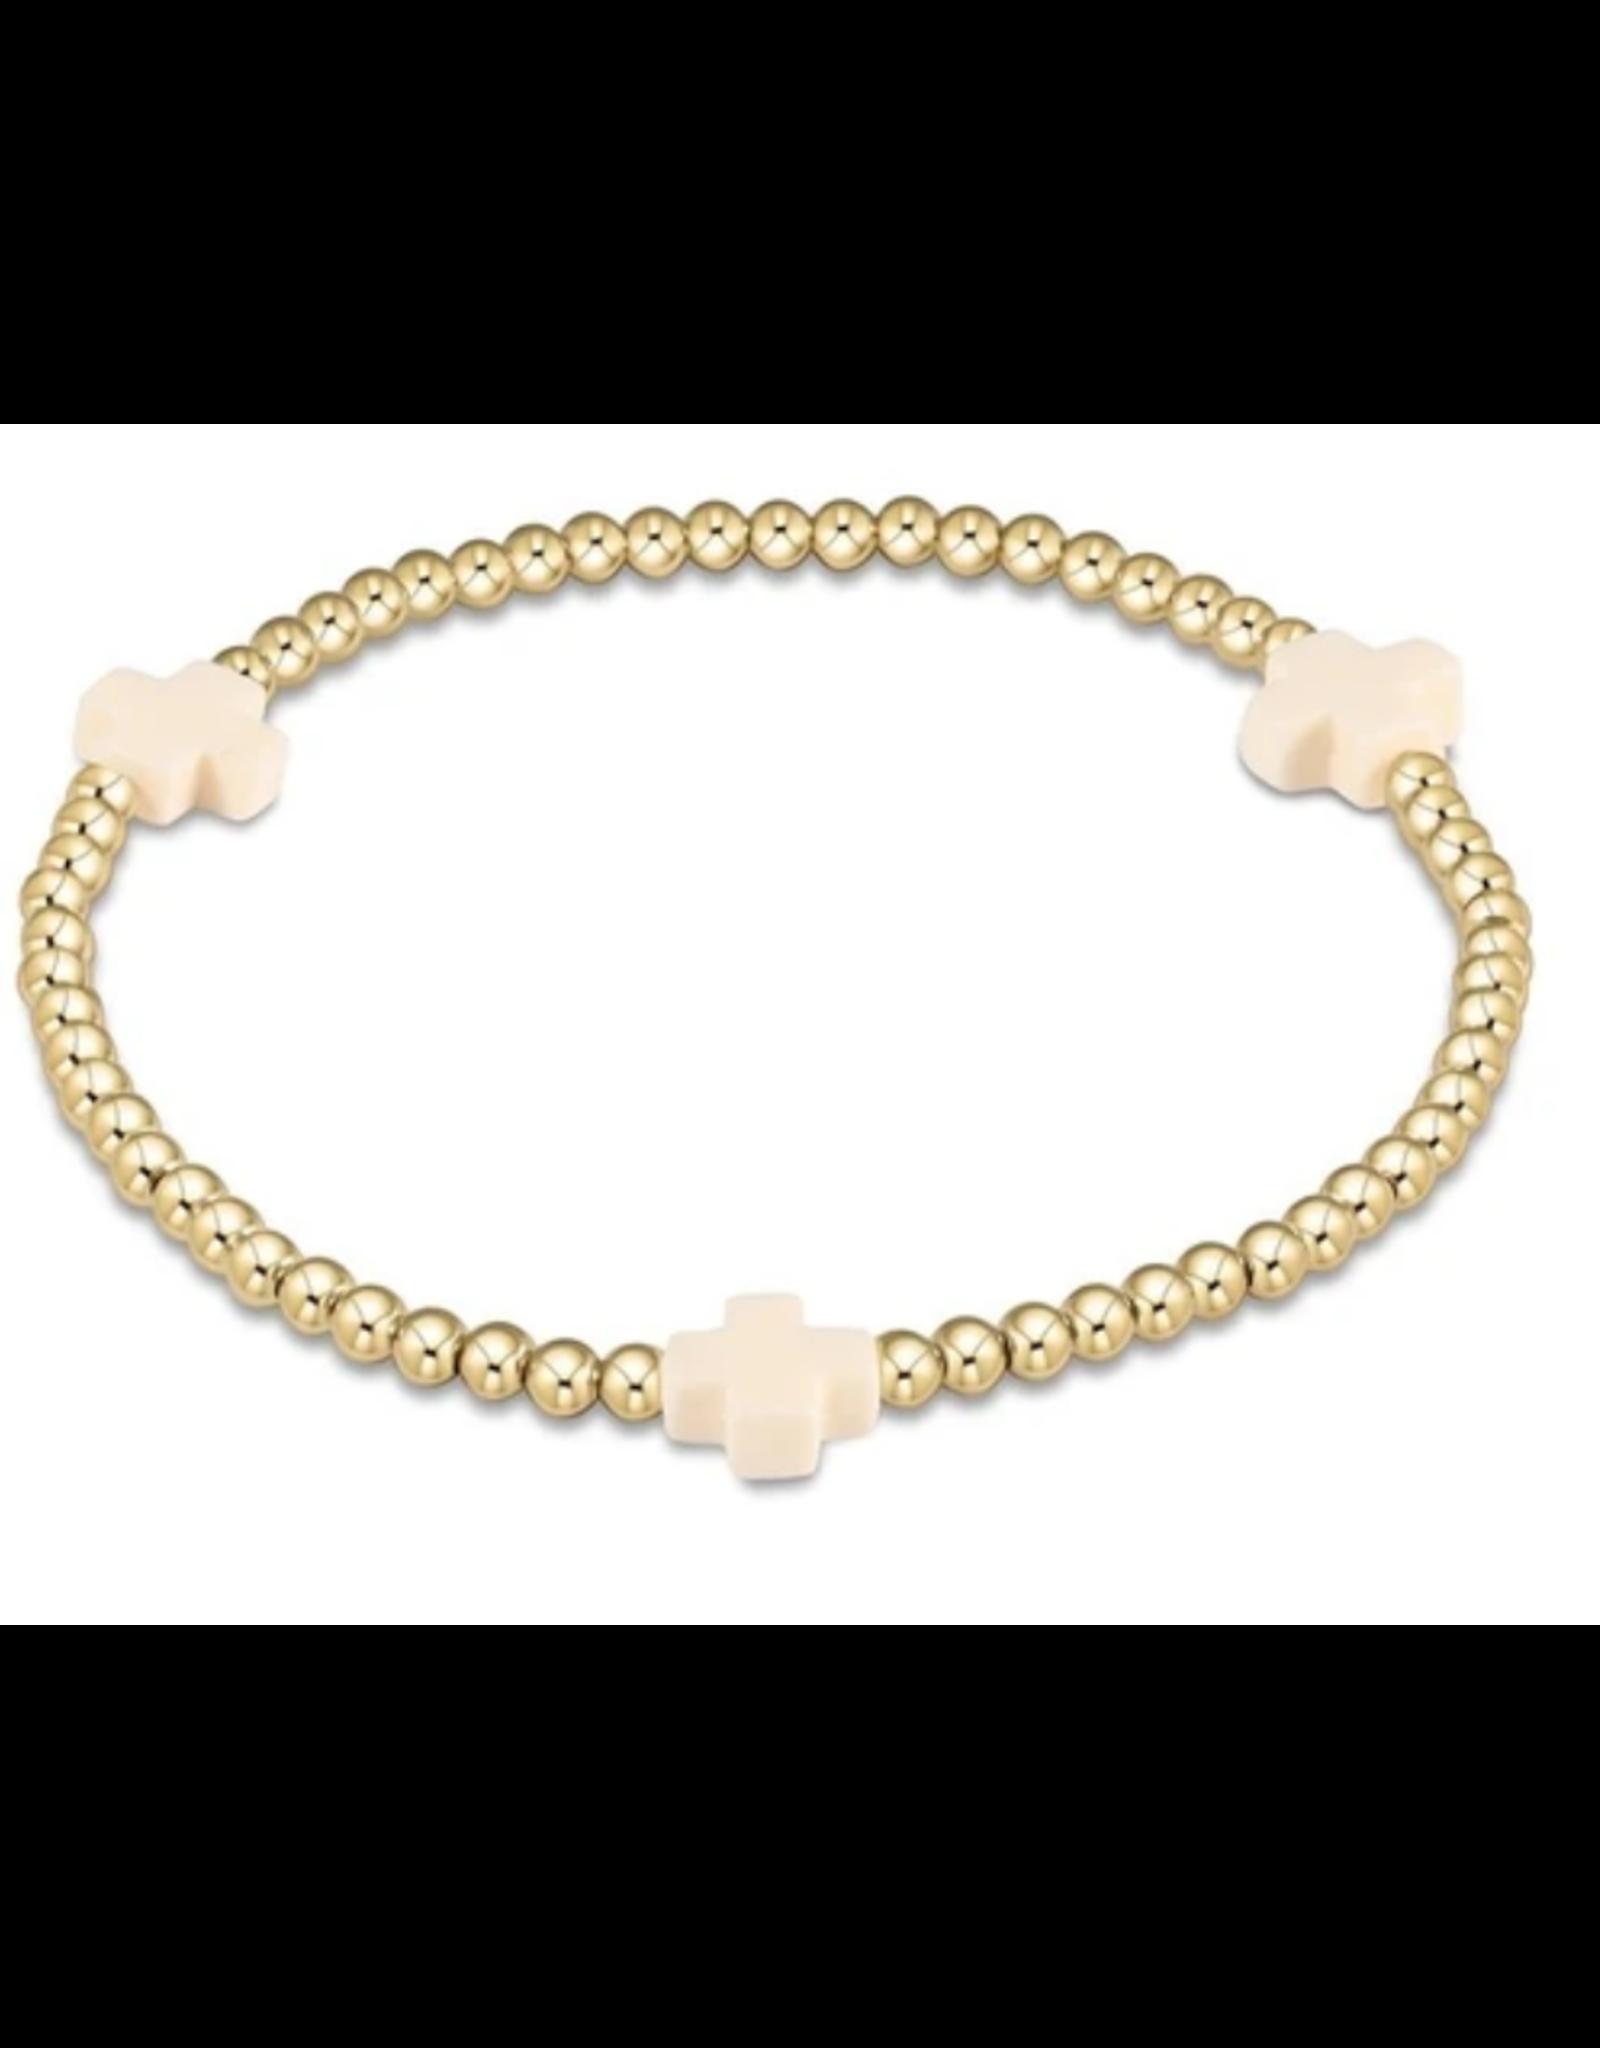 Off White- signature cross gold pattern 3mm bead bracelet